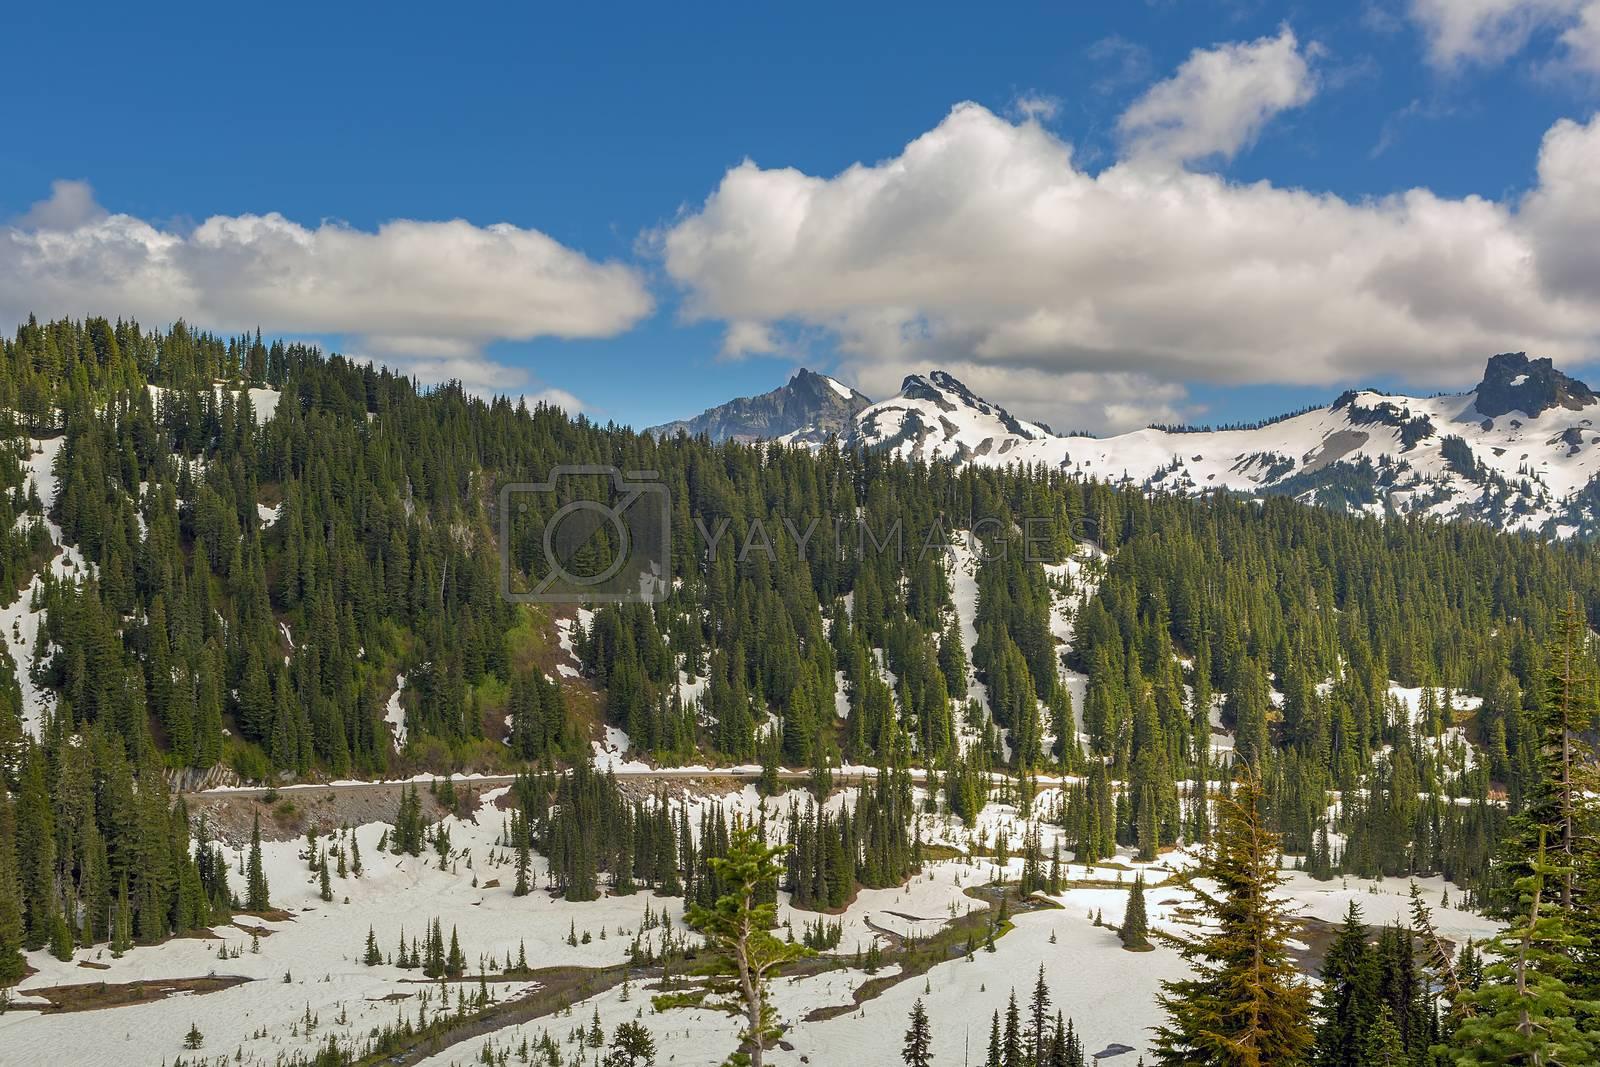 Mount Rainier National Park with snow covered Tatoosh Range scenic view in Washington State